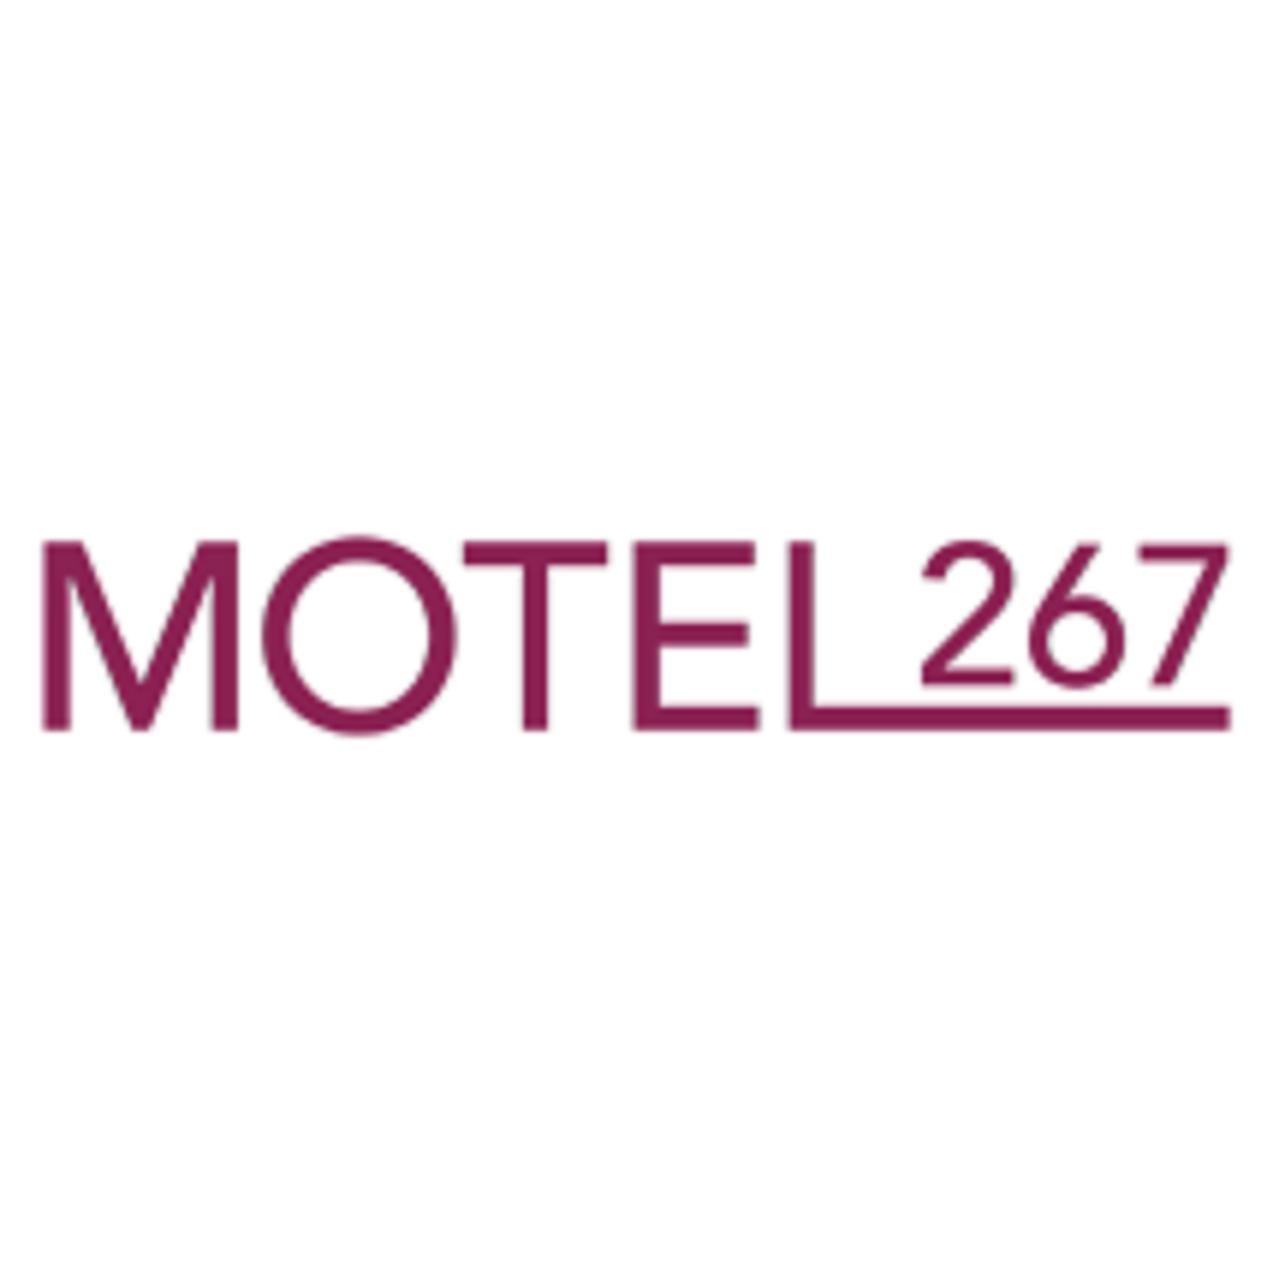 Motel 267